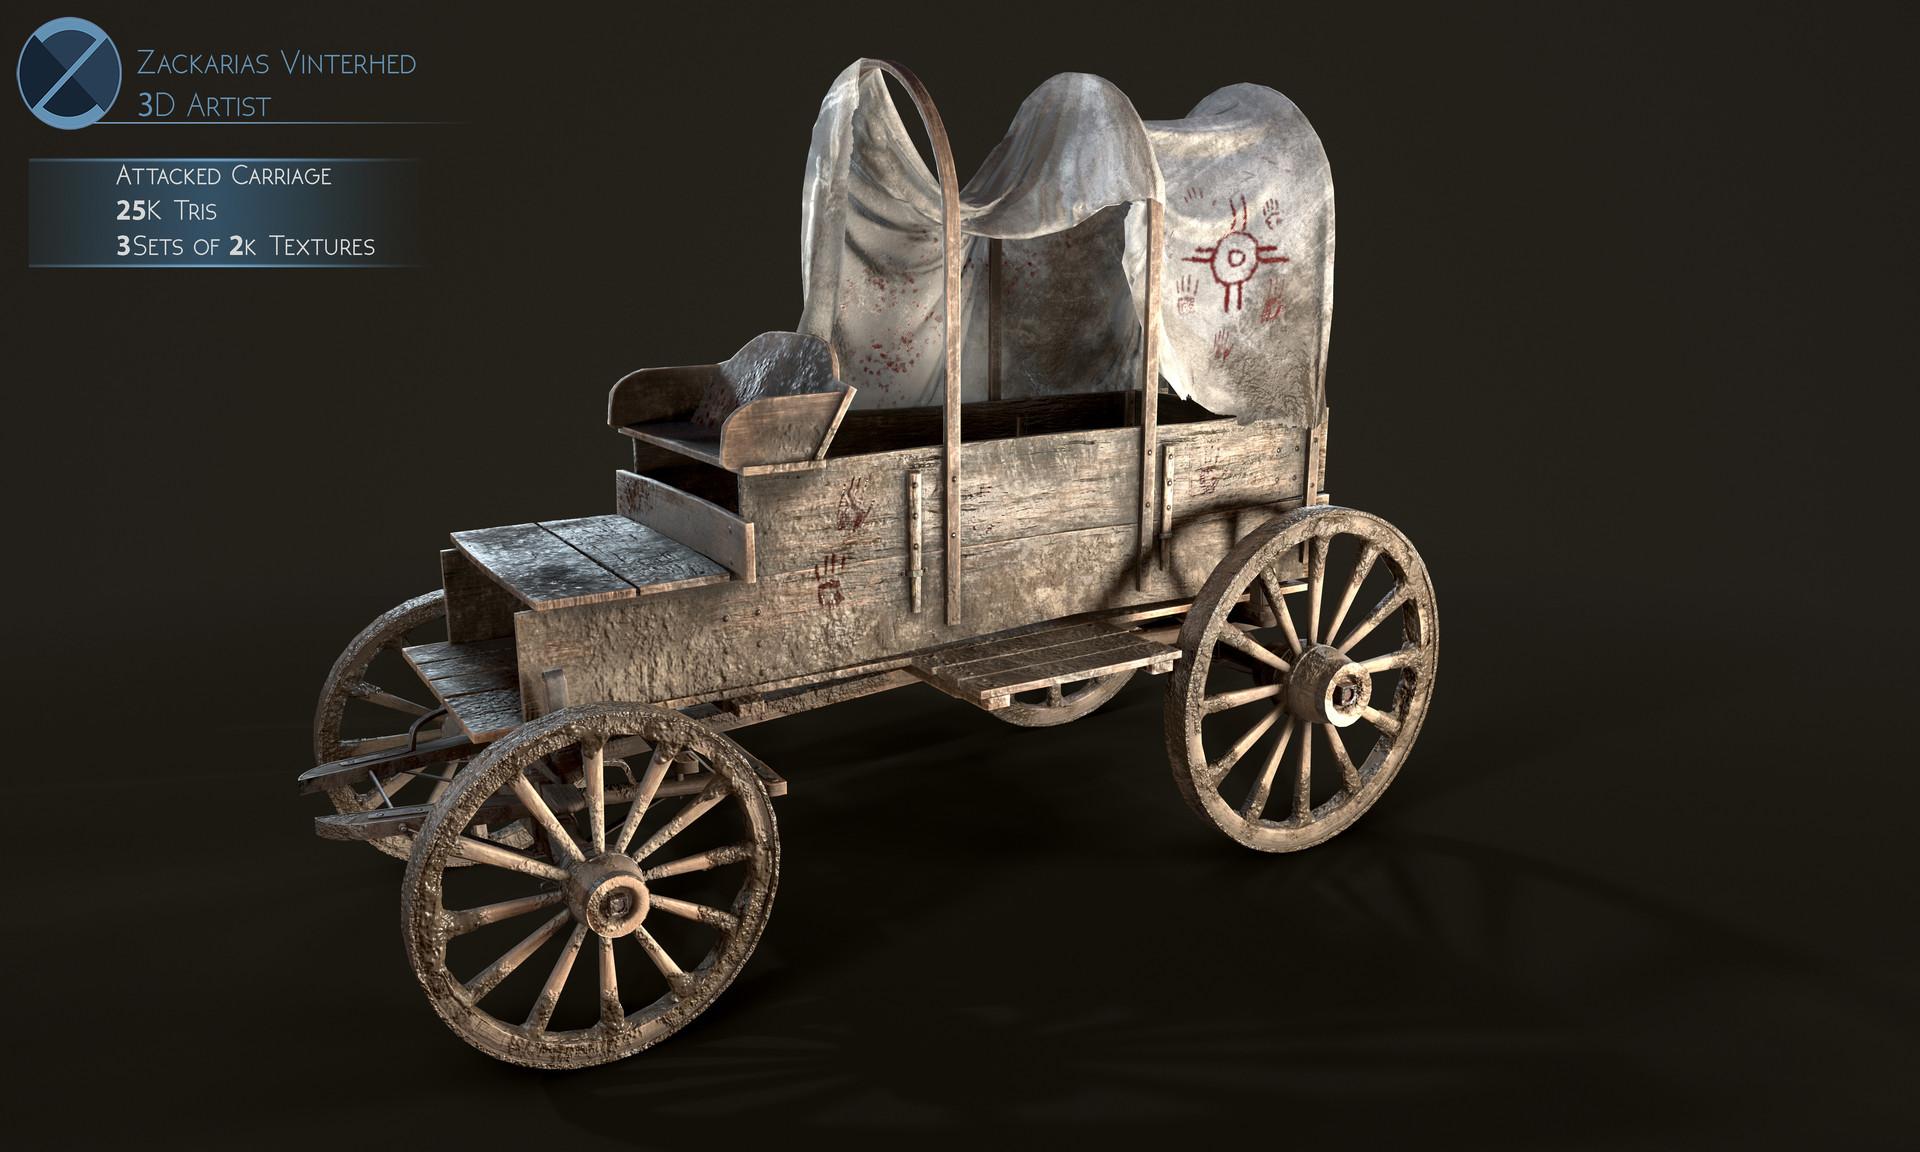 Zackarias vinterhed carriage 05